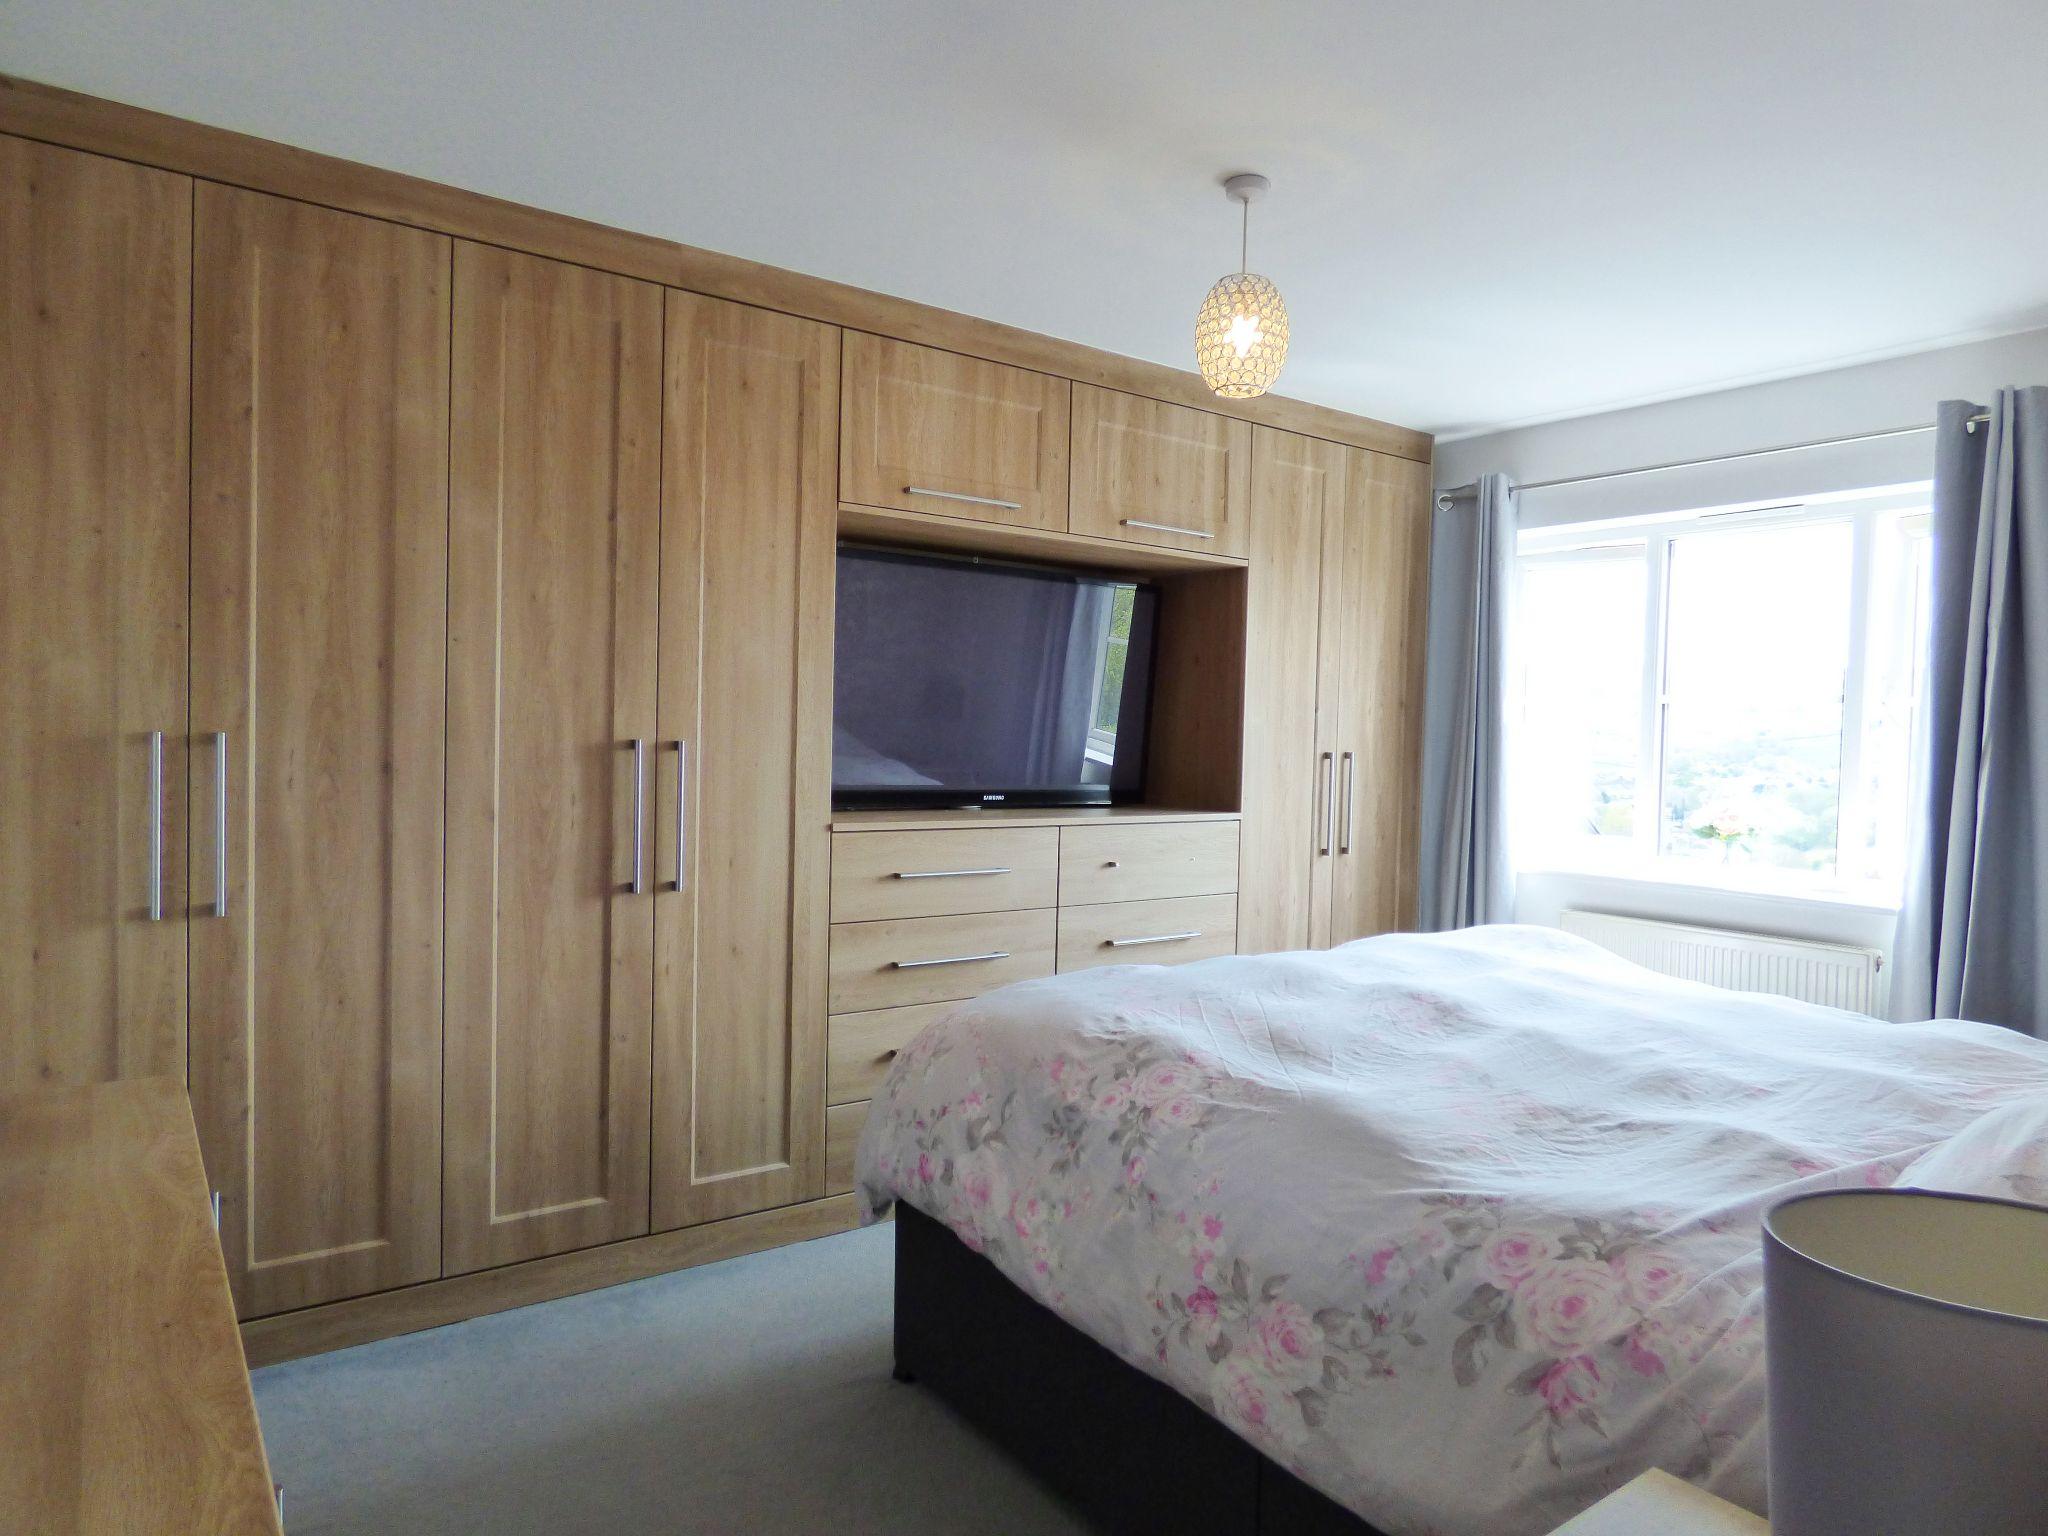 4 Bedroom Semi-detached House For Sale - Bedroom One